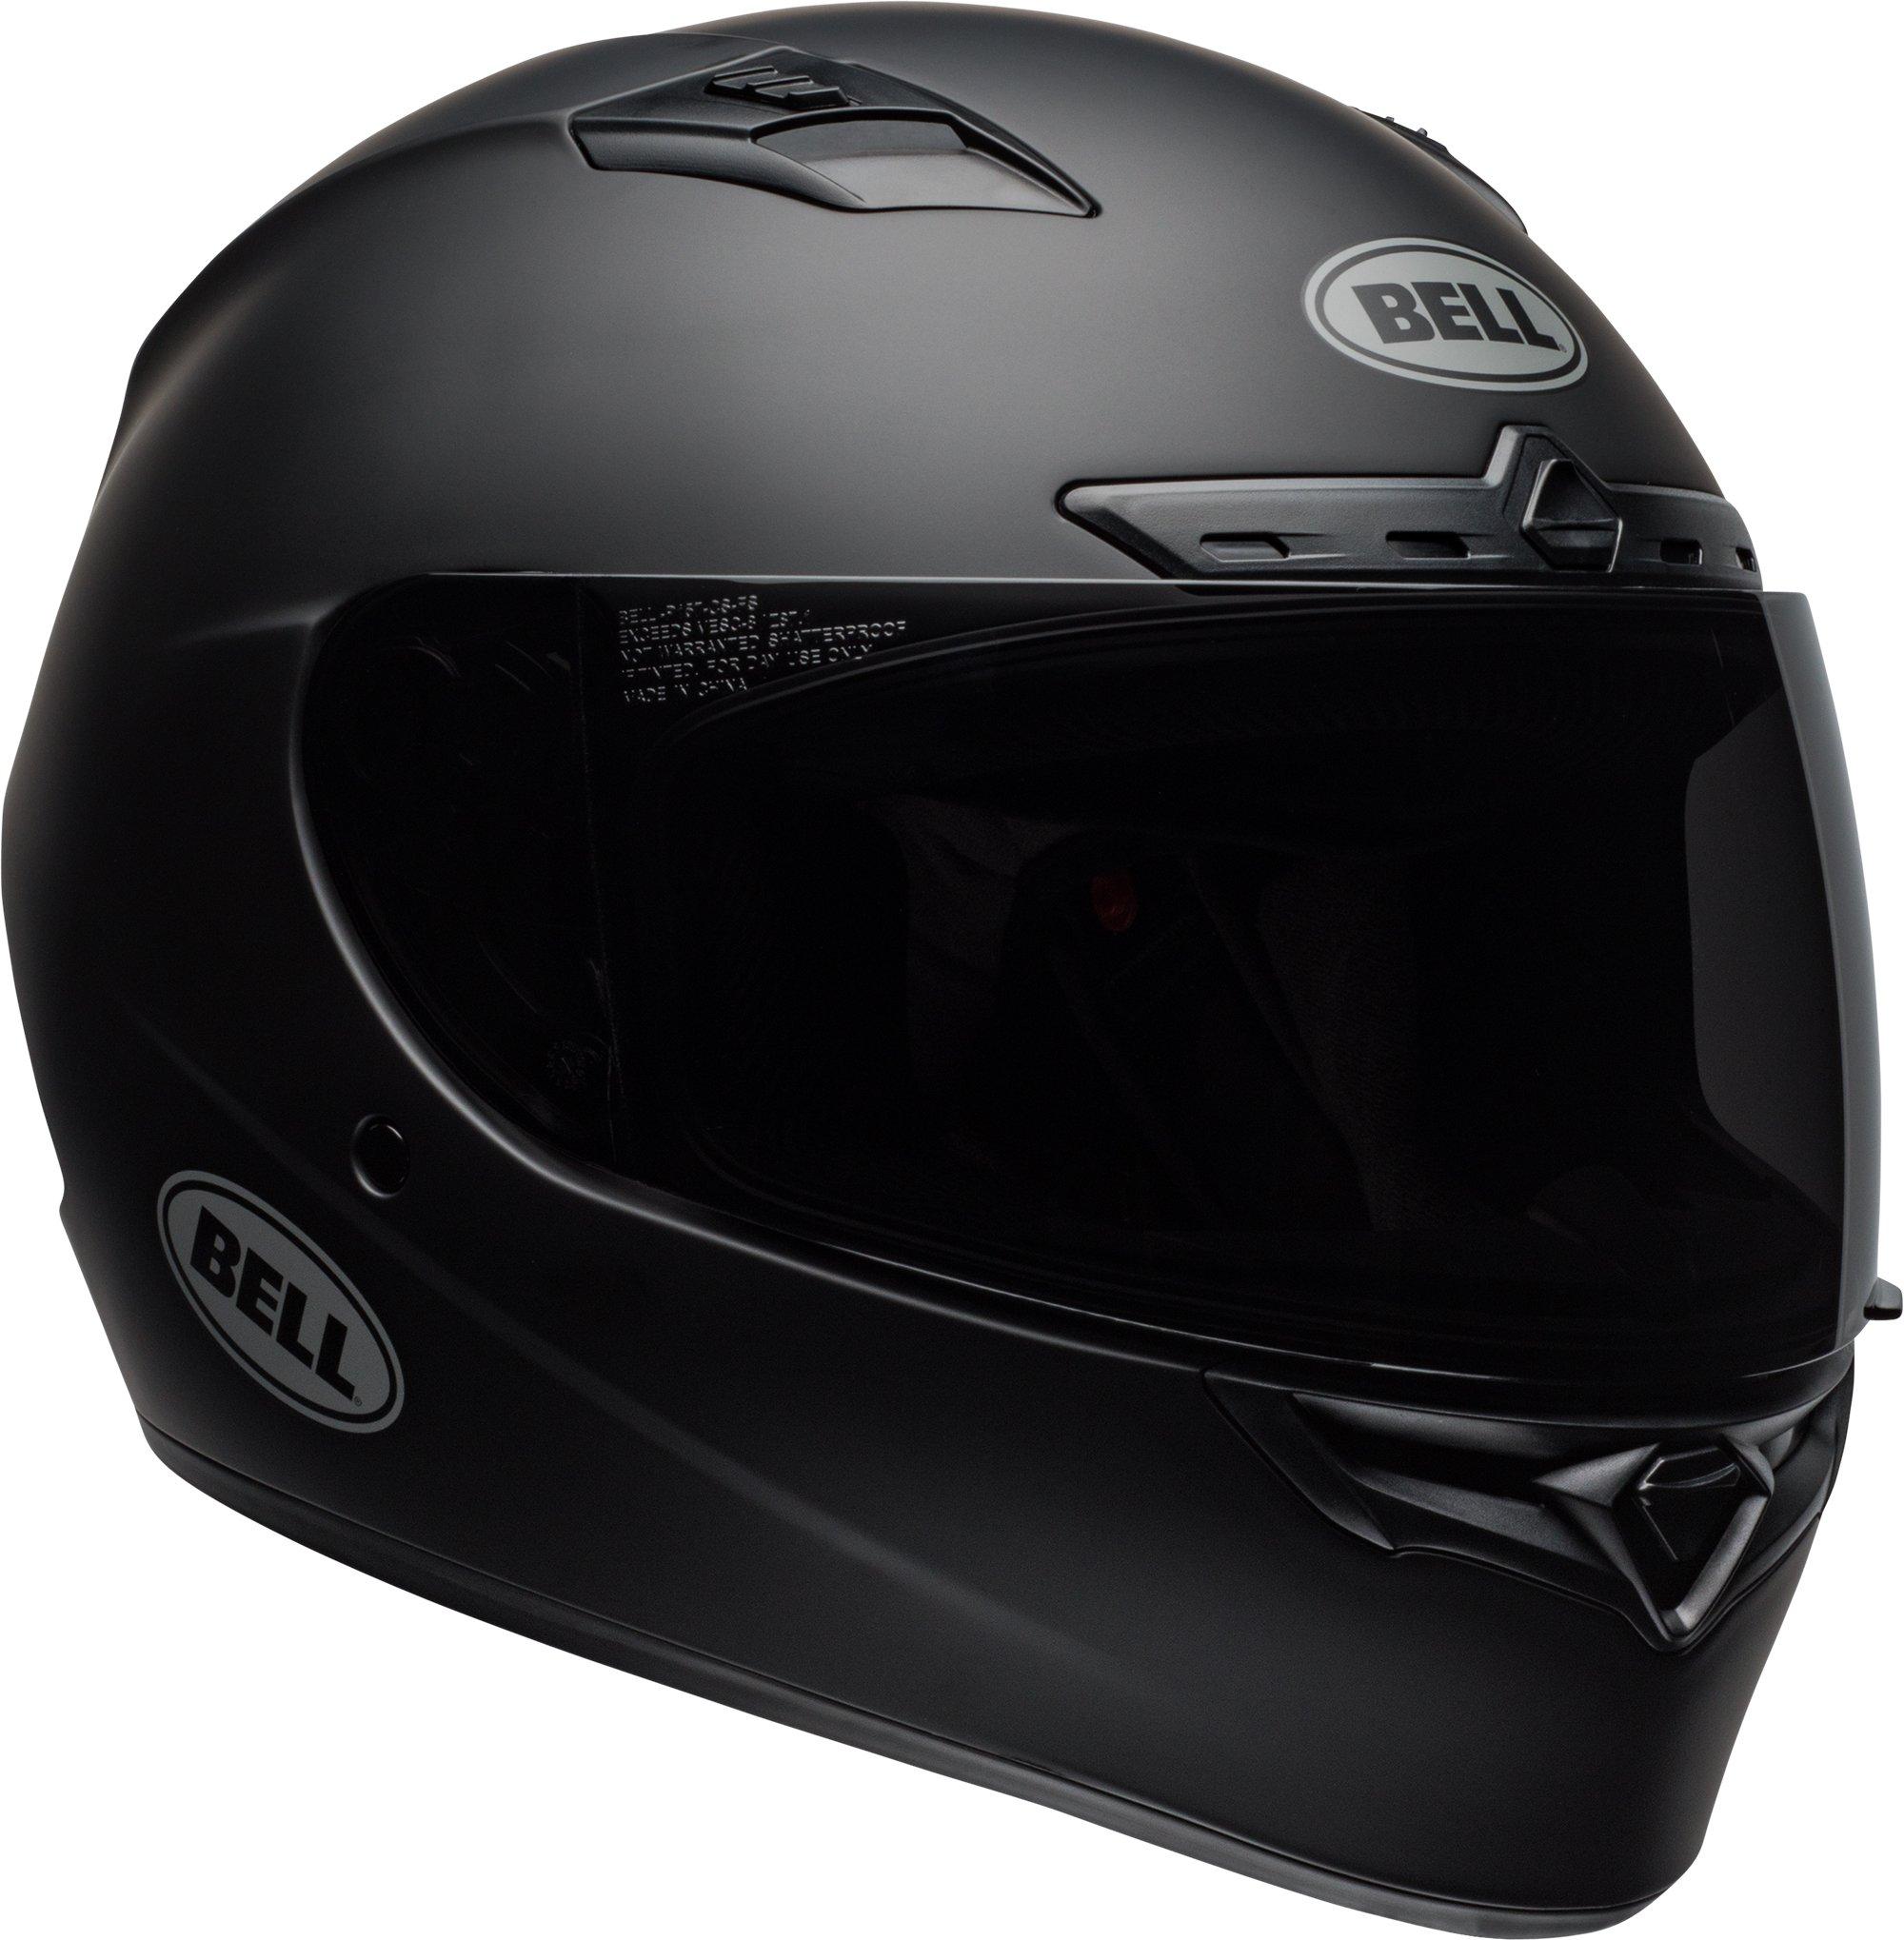 Bell Qualifier DLX MIPS Full-Face Motorcycle Helmet (Matte Black, Medium)